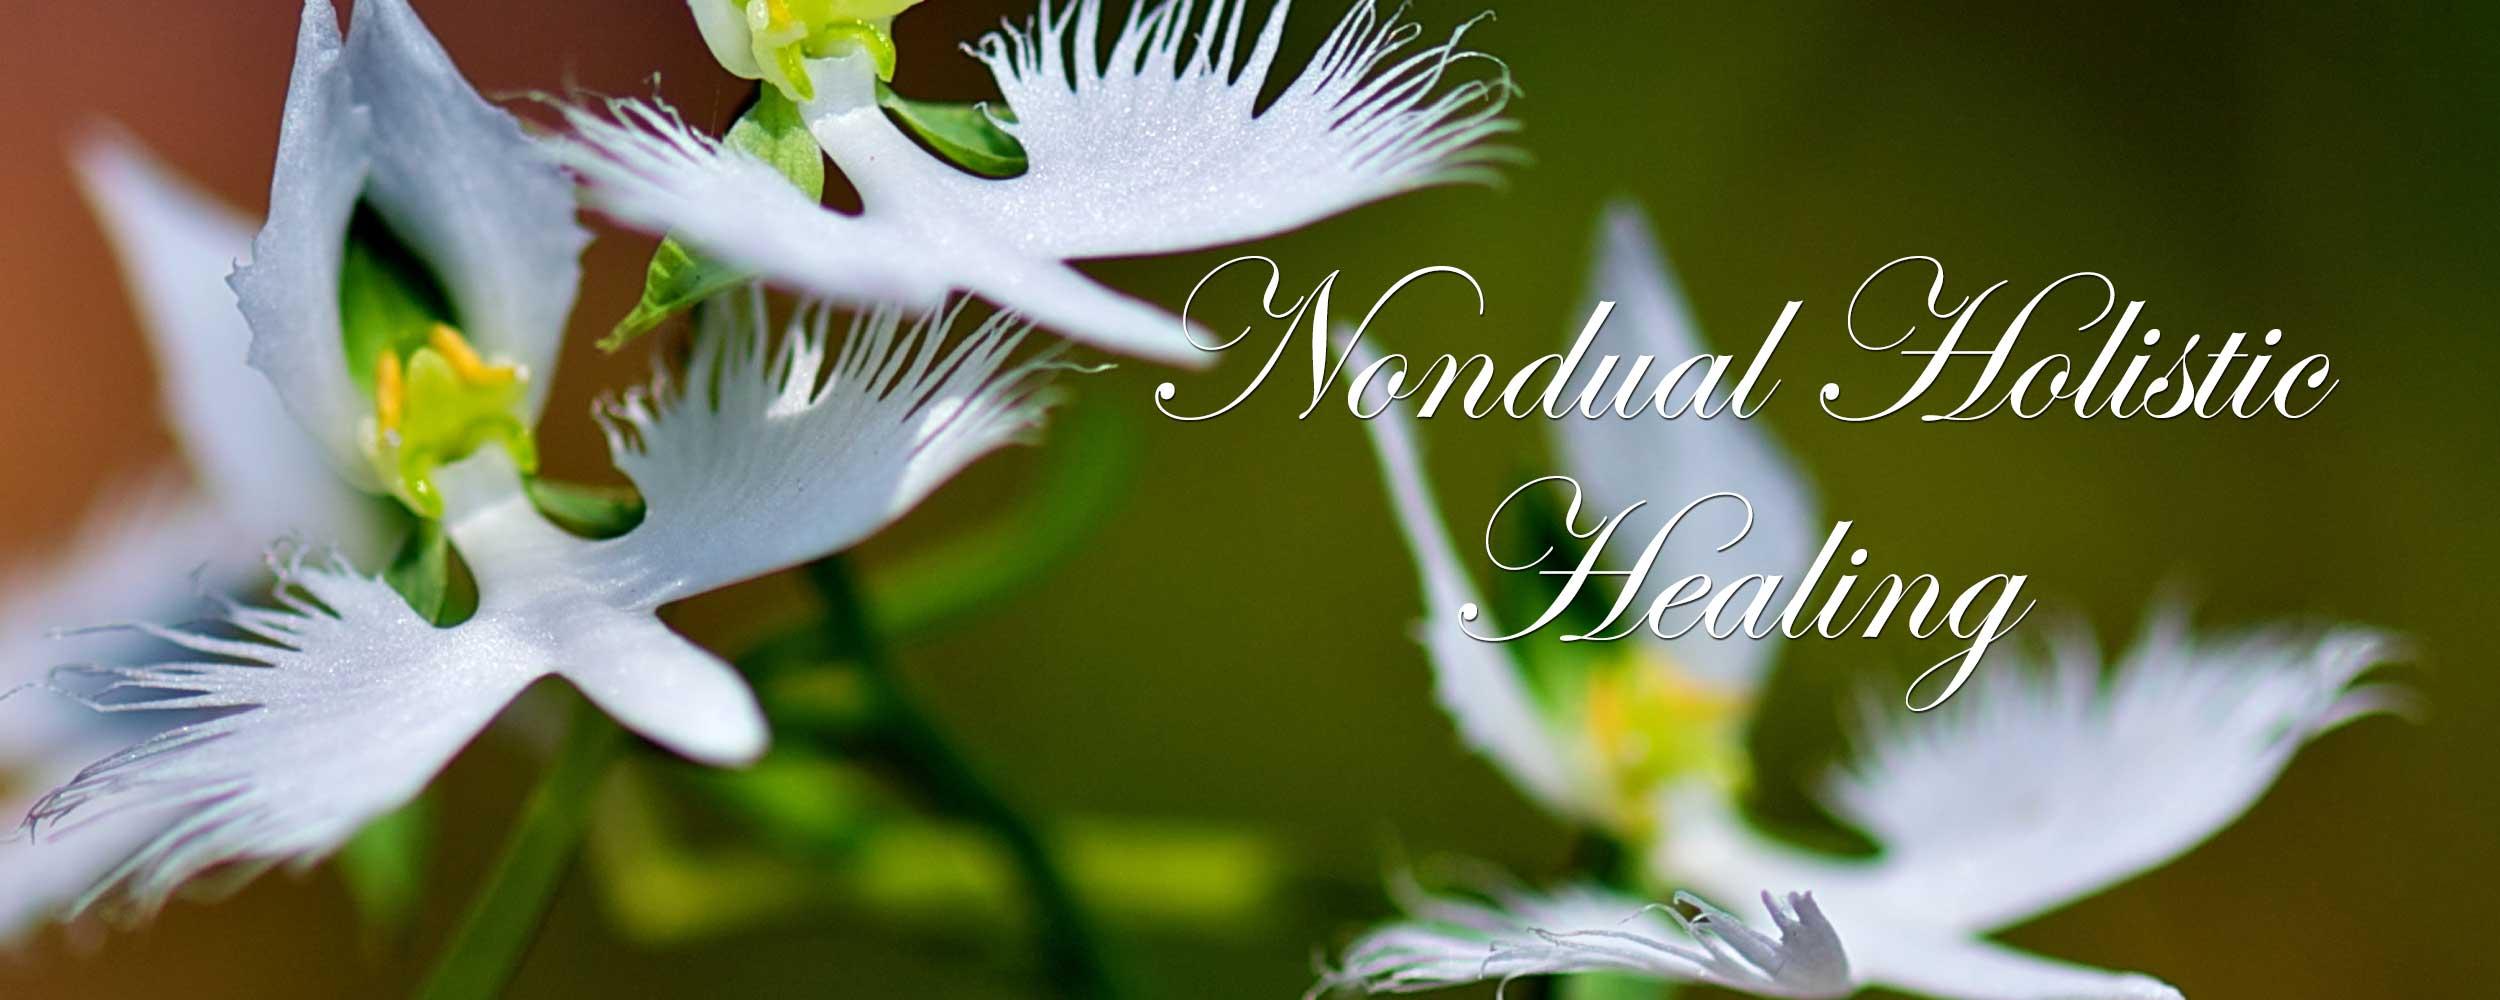 Nondual Holistic Healing